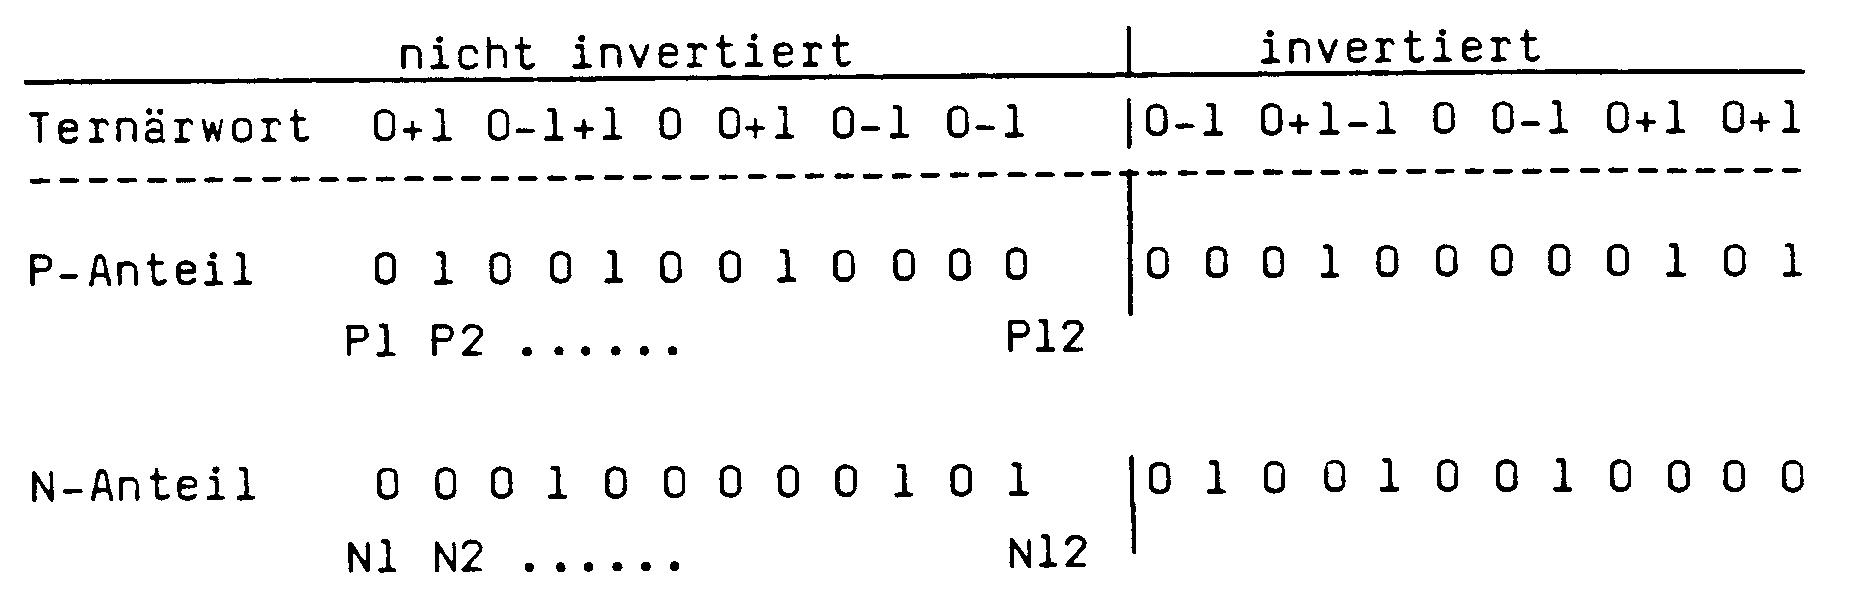 binare 24 nr)